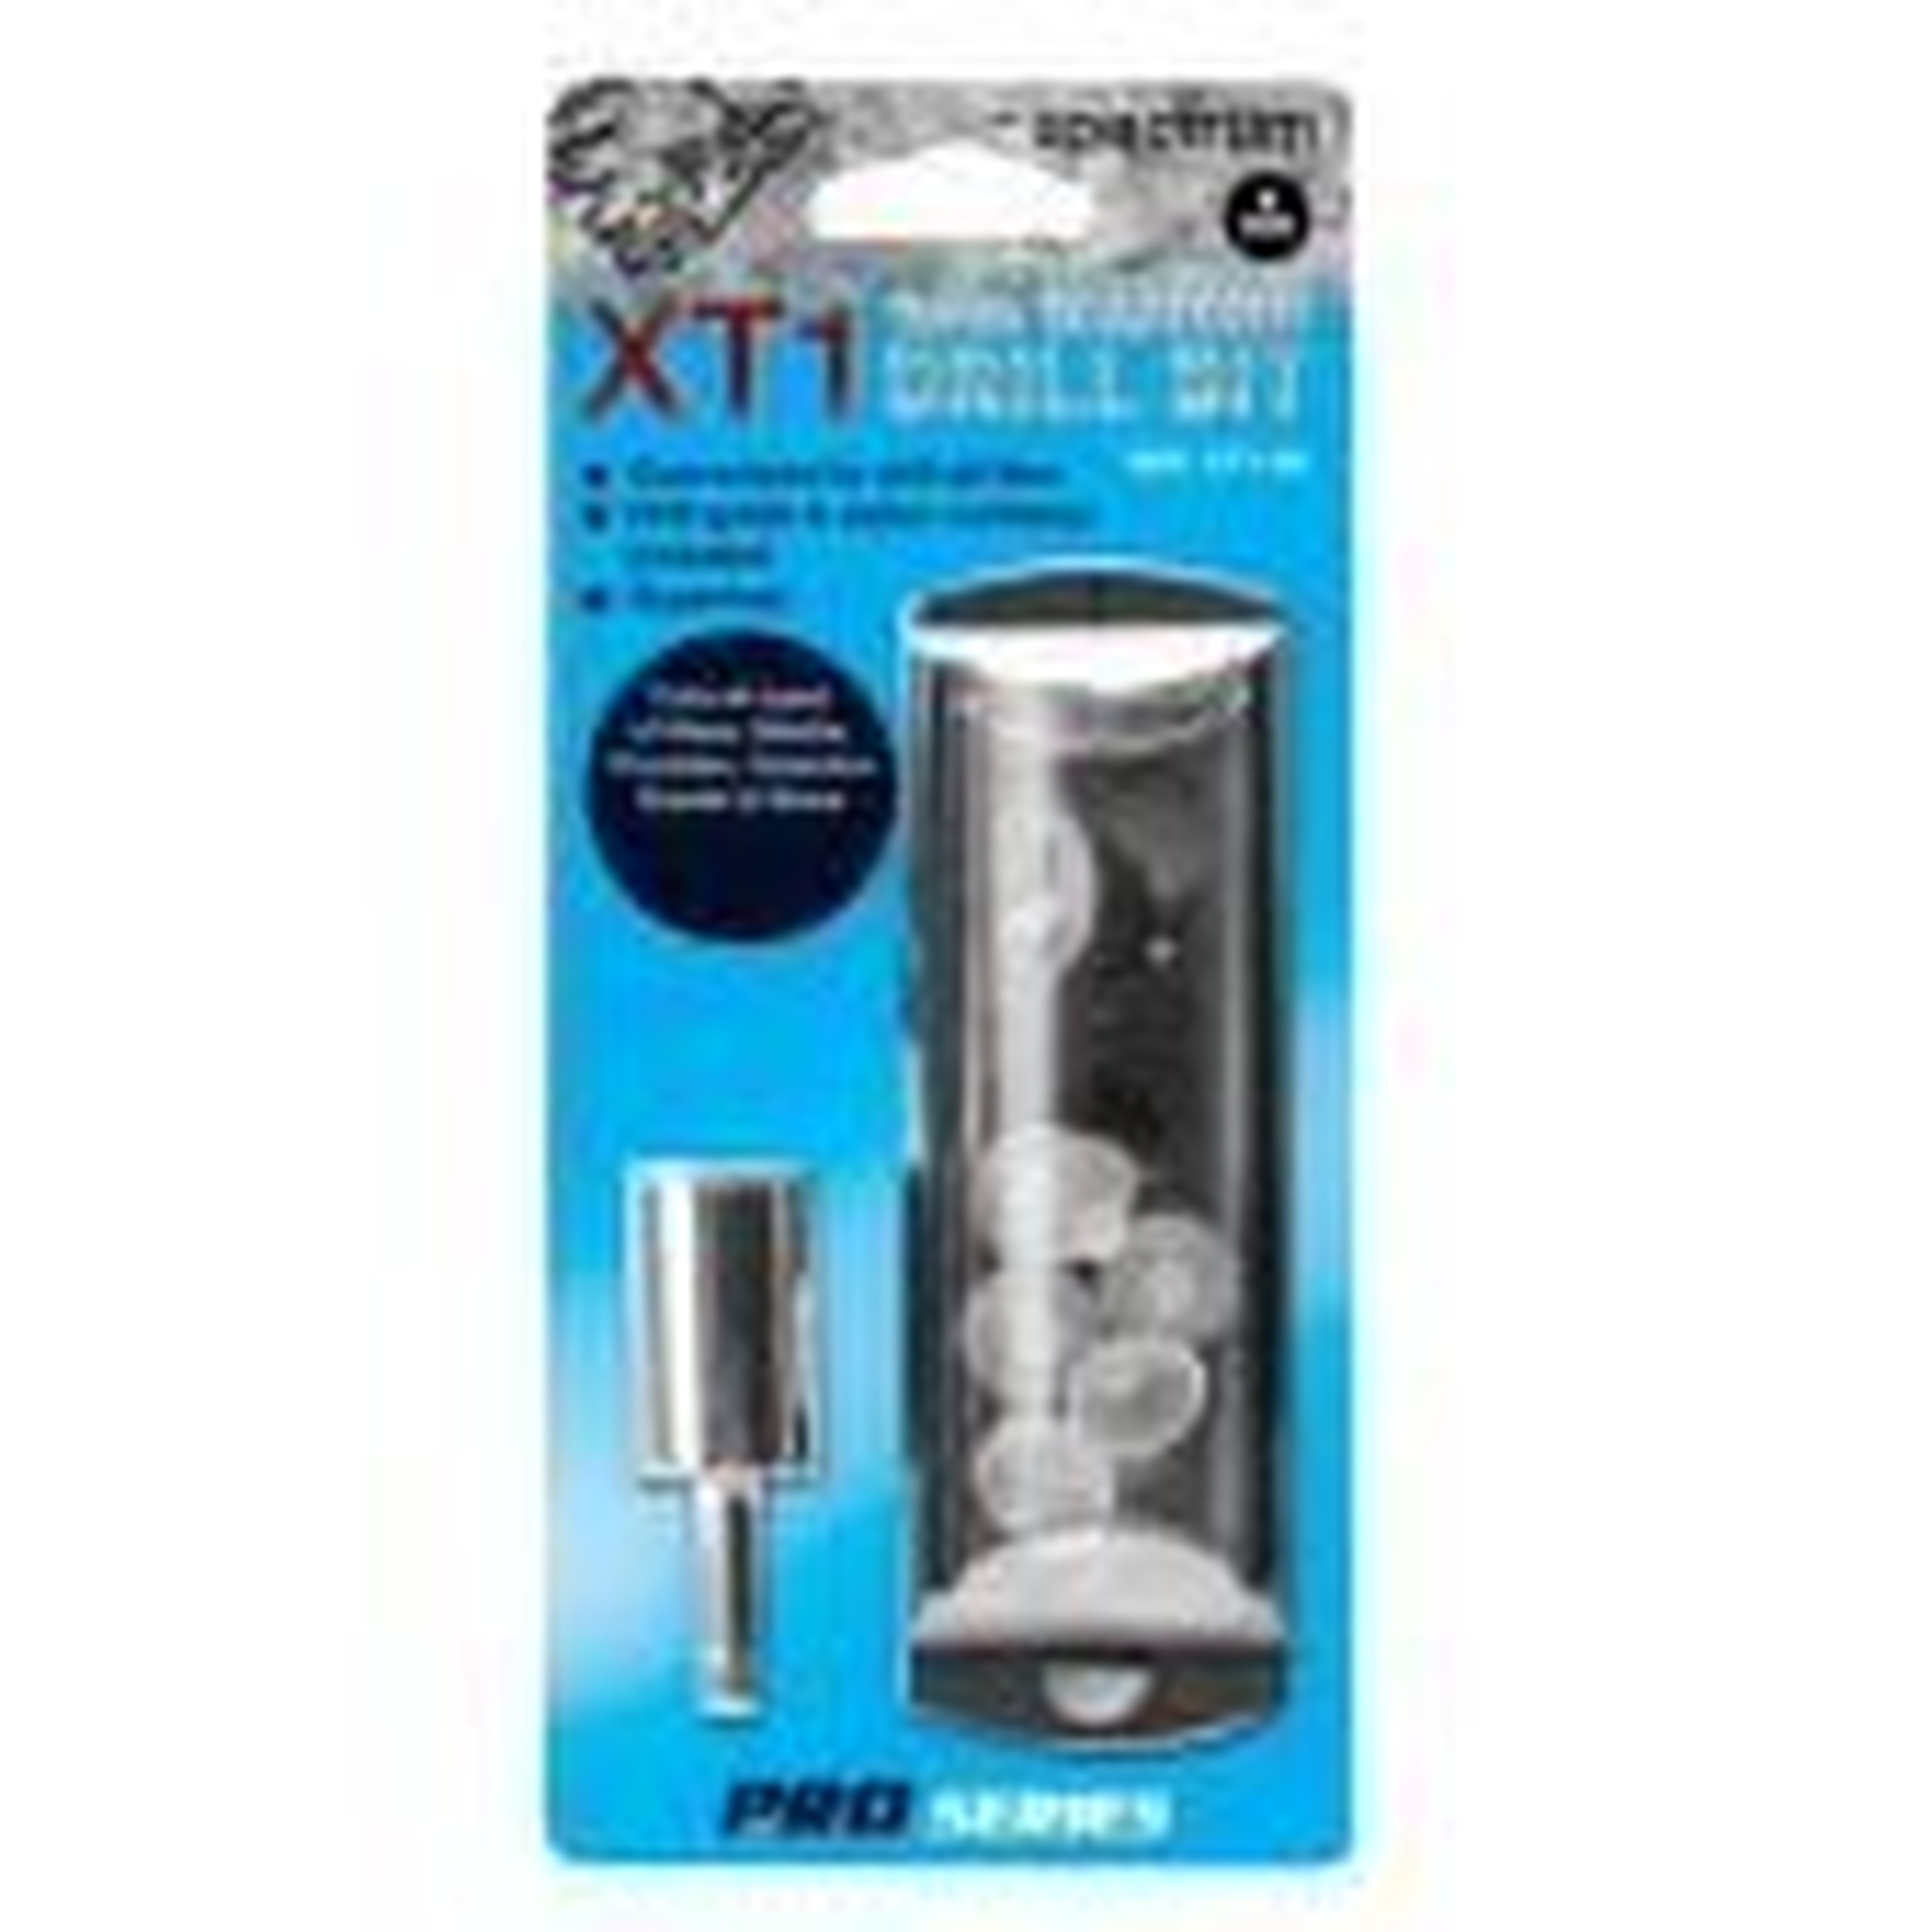 SPECTRUM XT1 DIAMOND TILE DRILL 8MM